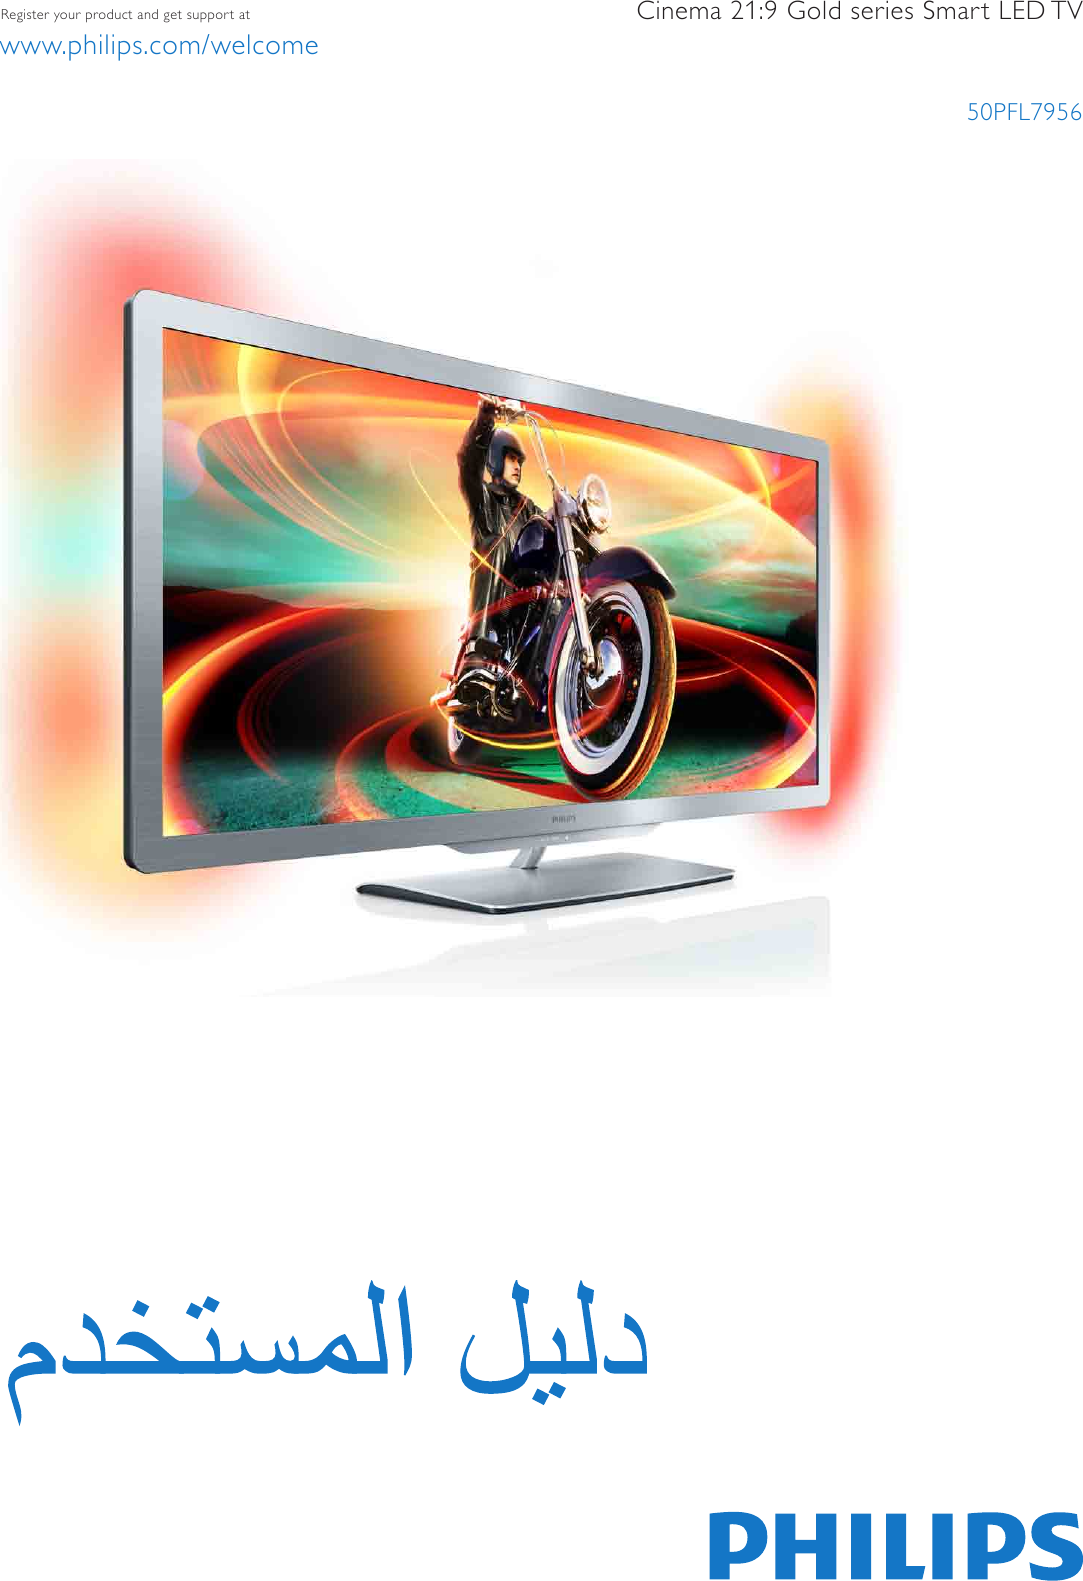 Philips 50PFL7956H/12 310432700502 User Manual Instrukcja Obs ugi ...